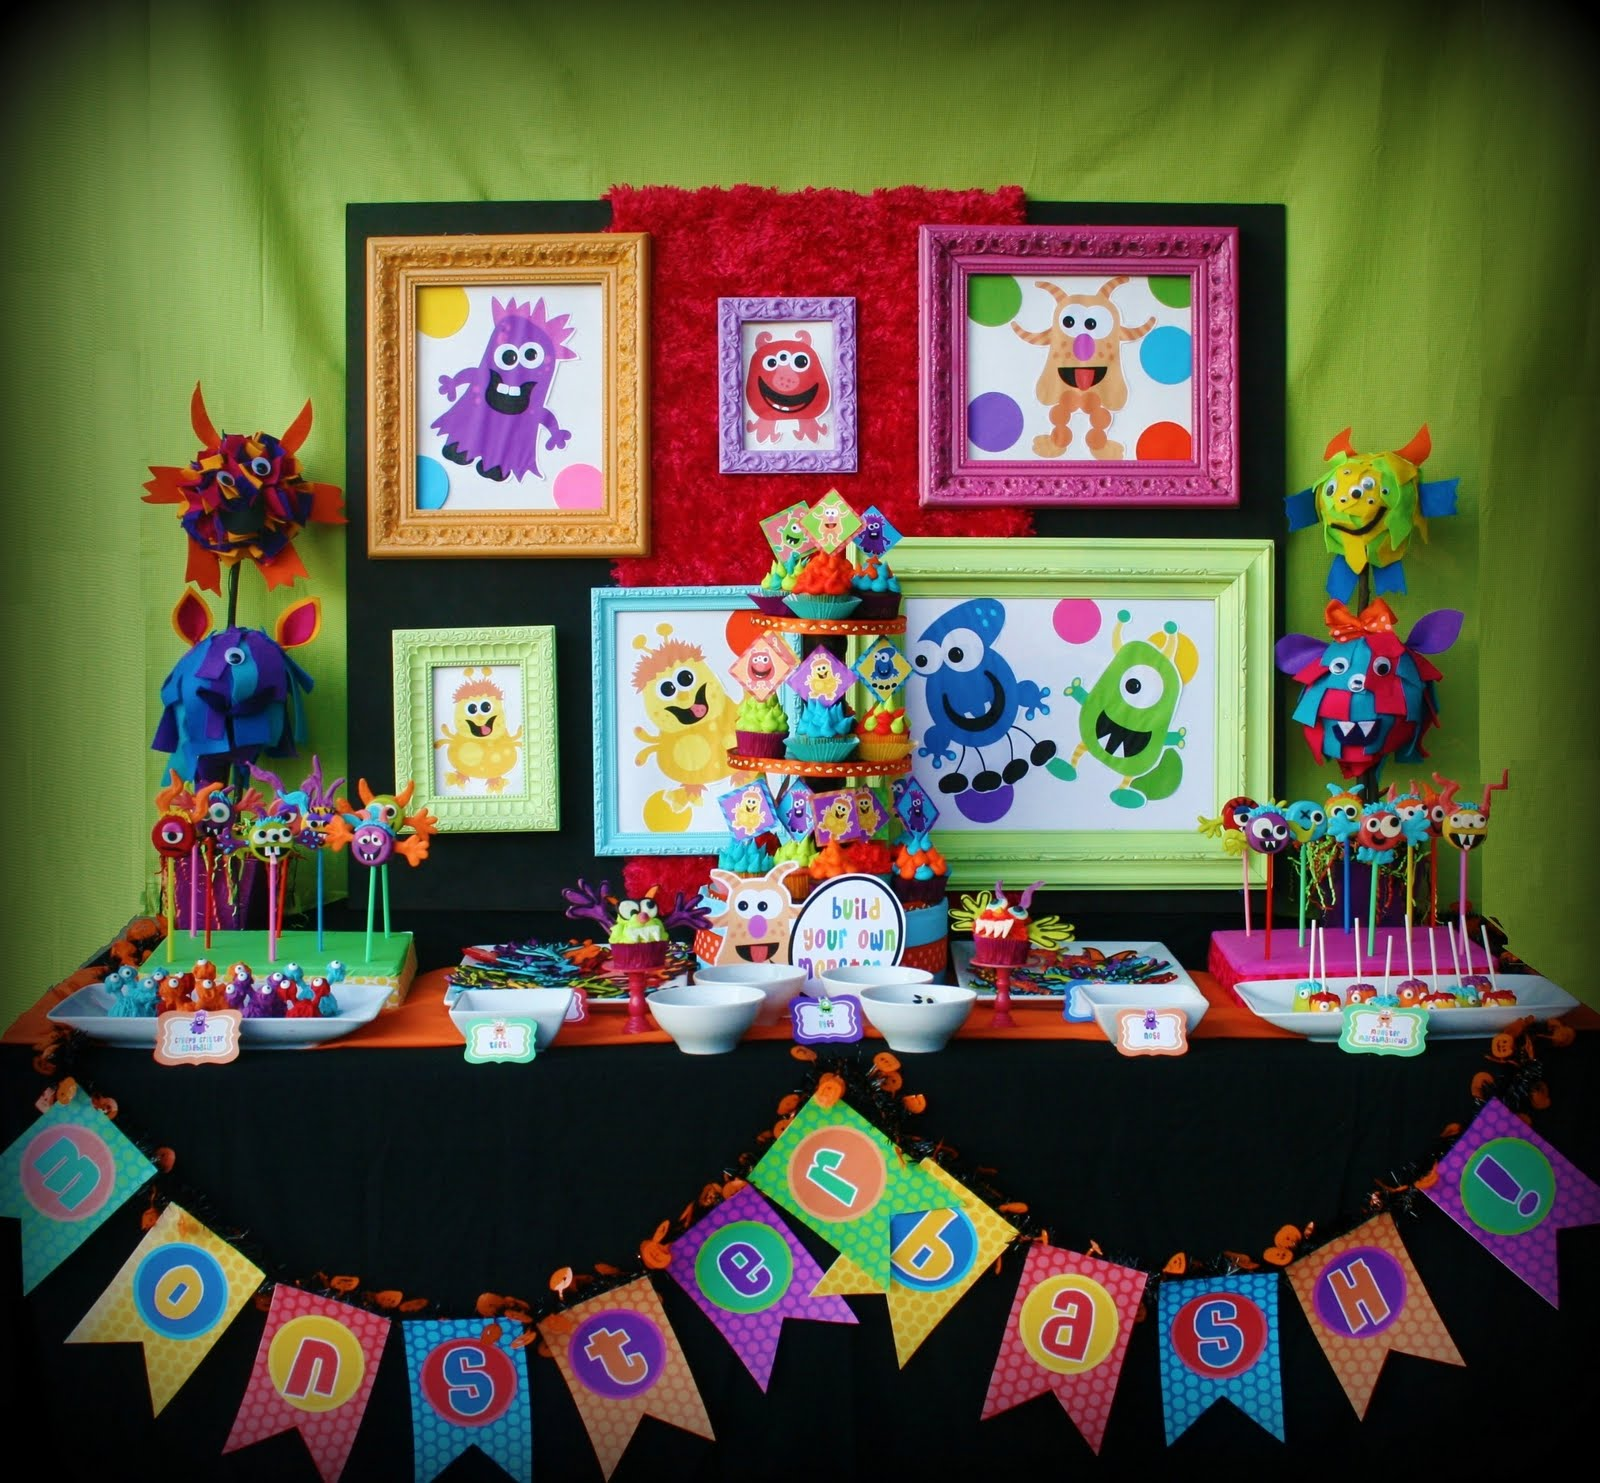 Kids Birthday Party Ideas - Birthday